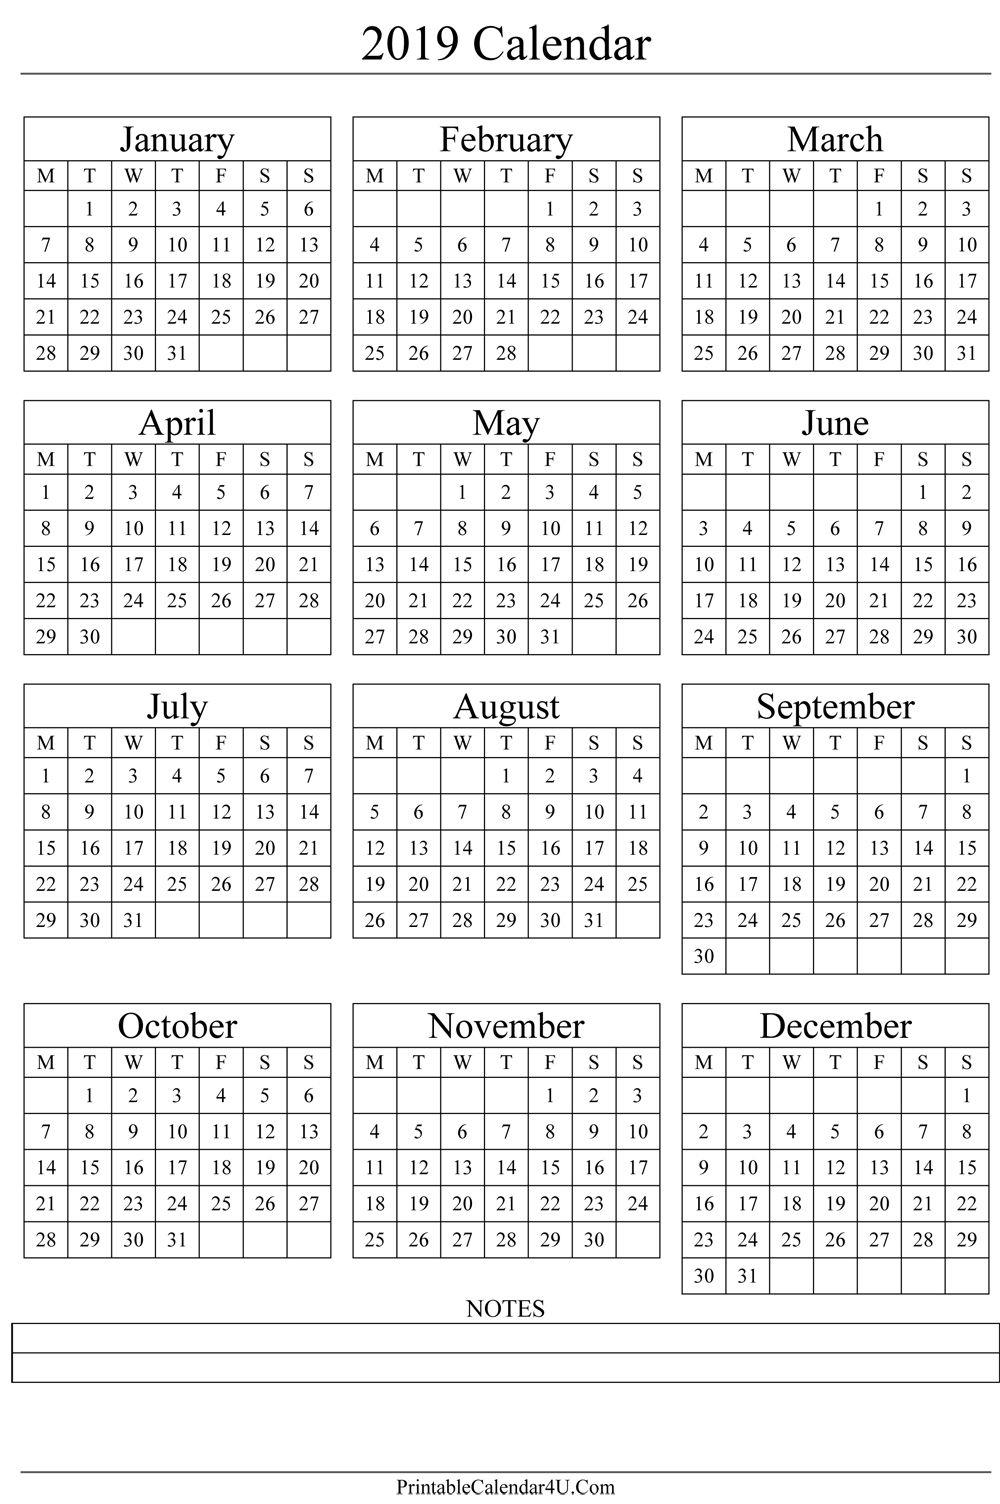 Annual Calendar 2019 Portrait Printable Calendar 2017 | Gift Ideas pertaining to Free Printable Calendar Templates 8 X 10